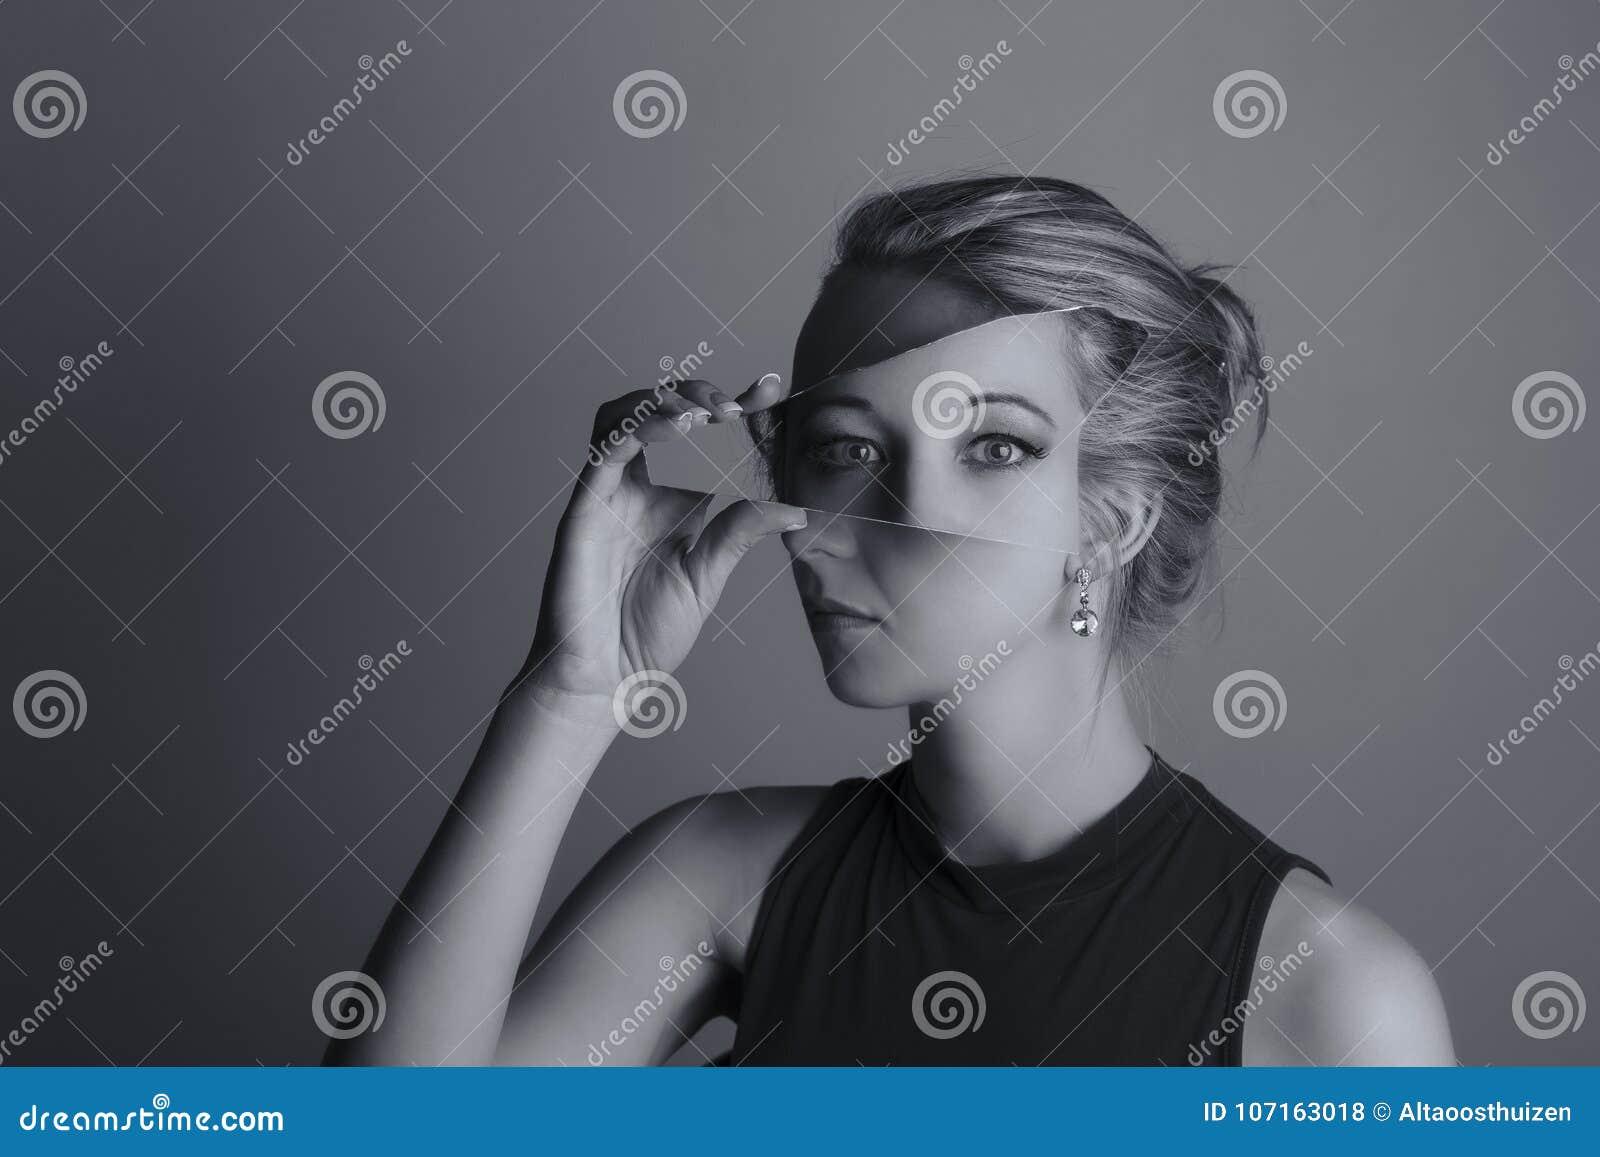 Creative conversion of woman holding a shard of broken mirror